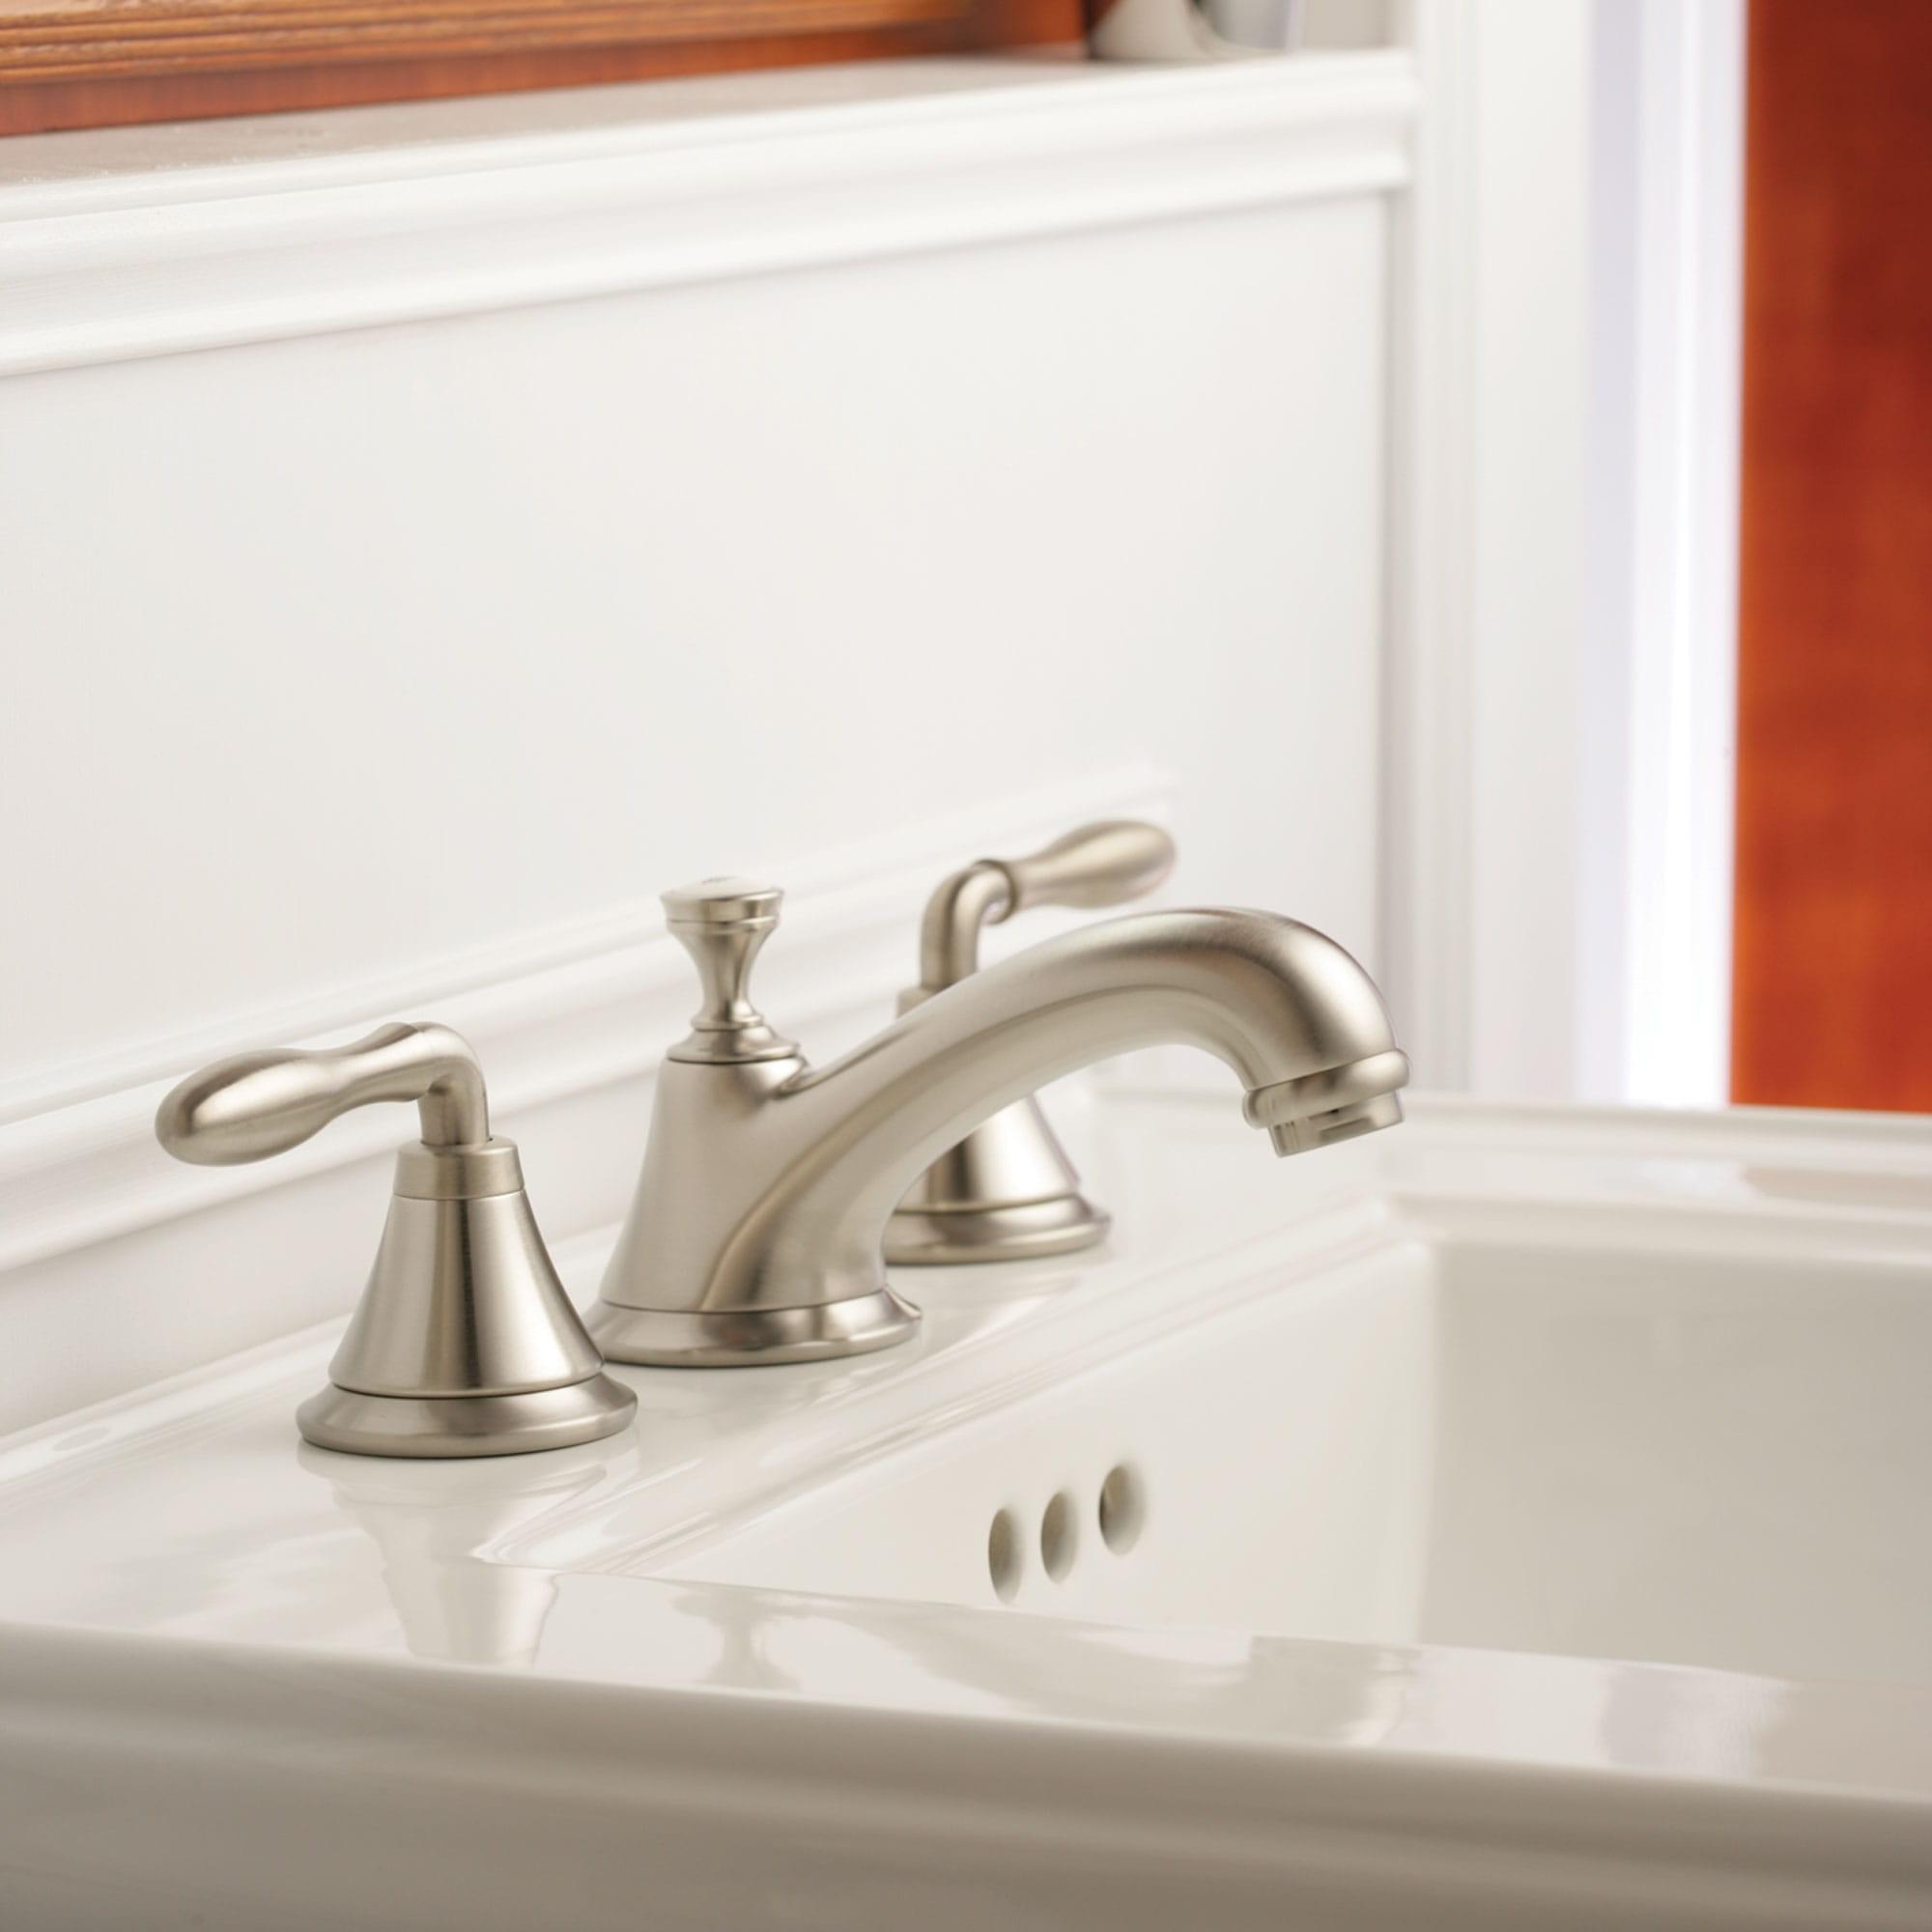 robinet avec fond blanc et évier blanc